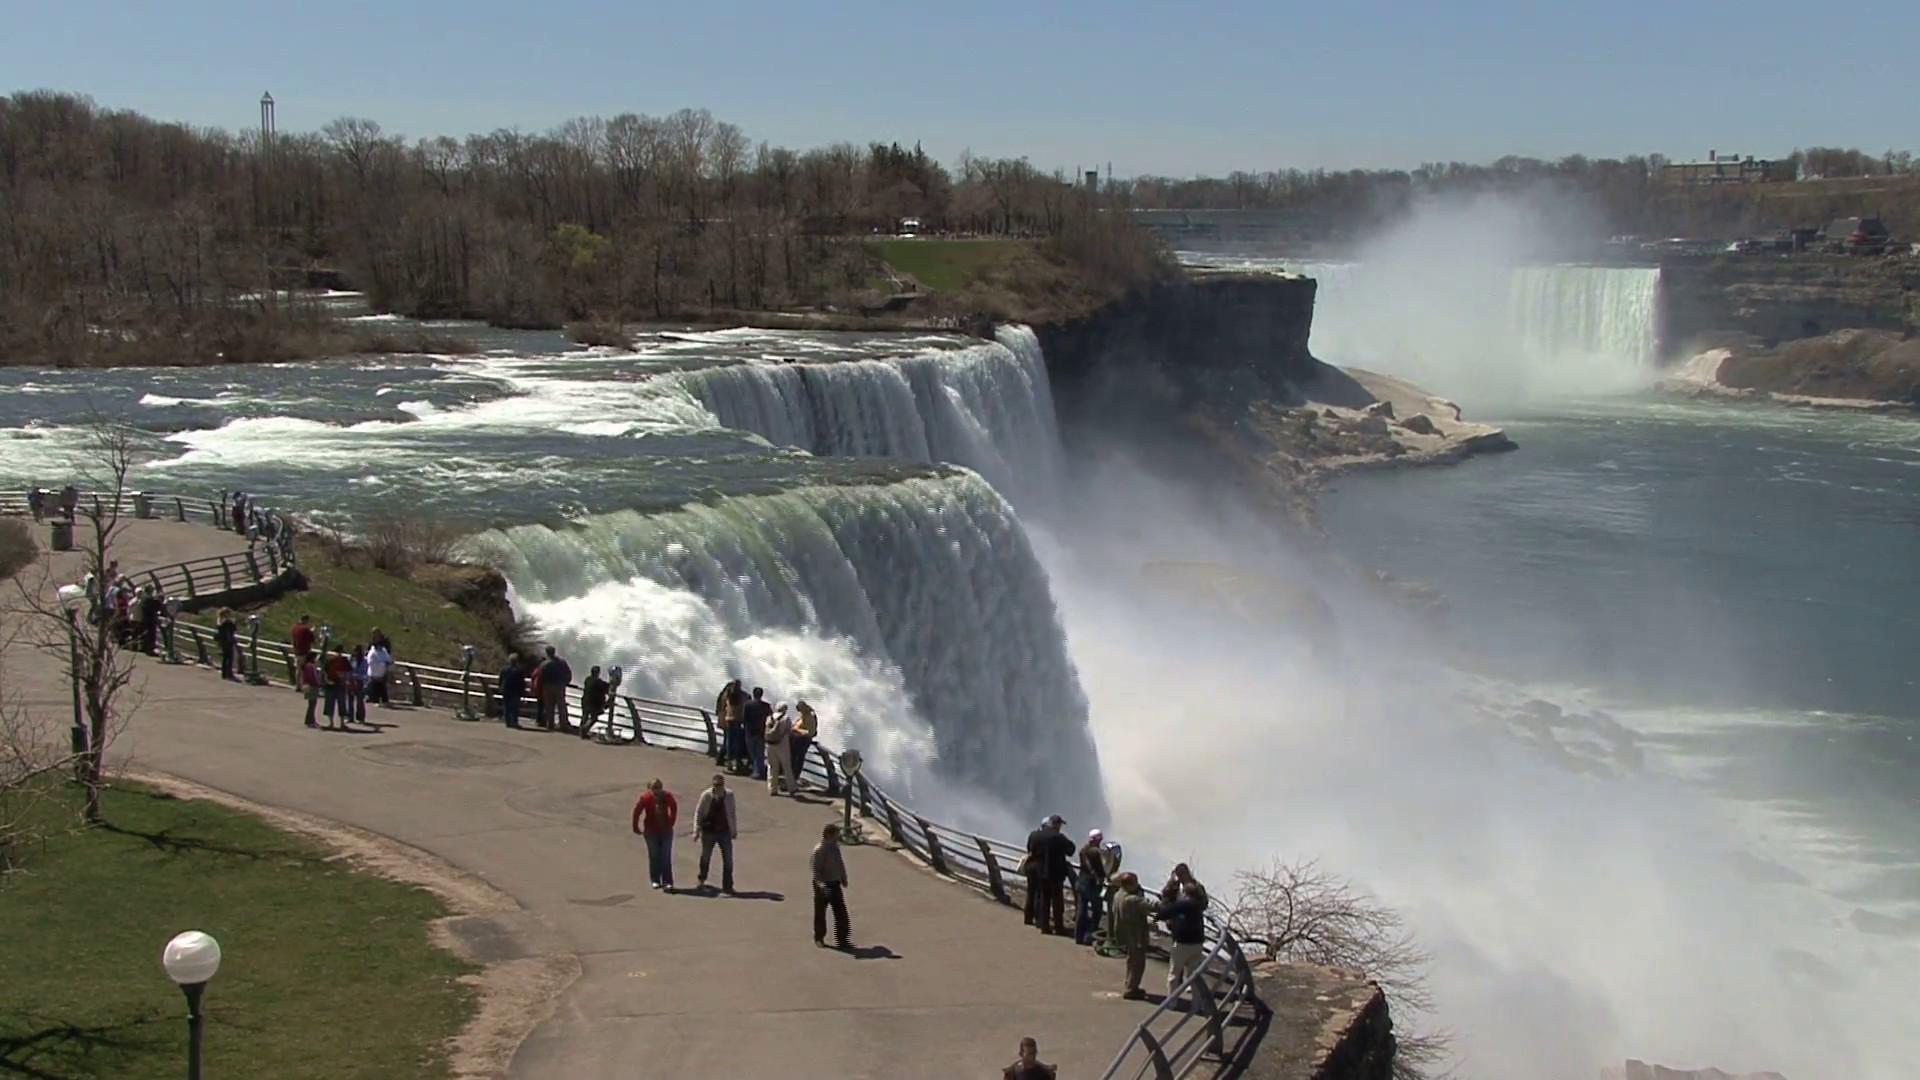 Niagara Falls Hd Wallpaper Niagara Falls Background 183 ① Wallpapertag